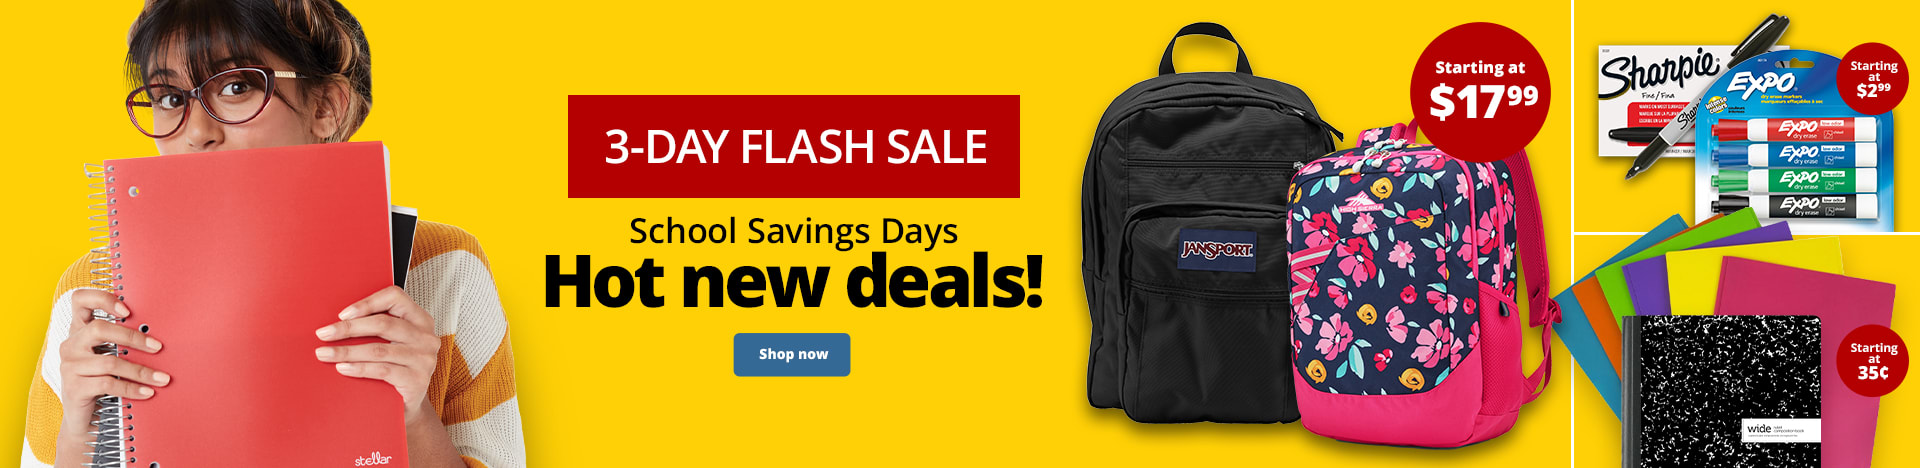 3-Day Sale. School Savings Days. Hot new deals!